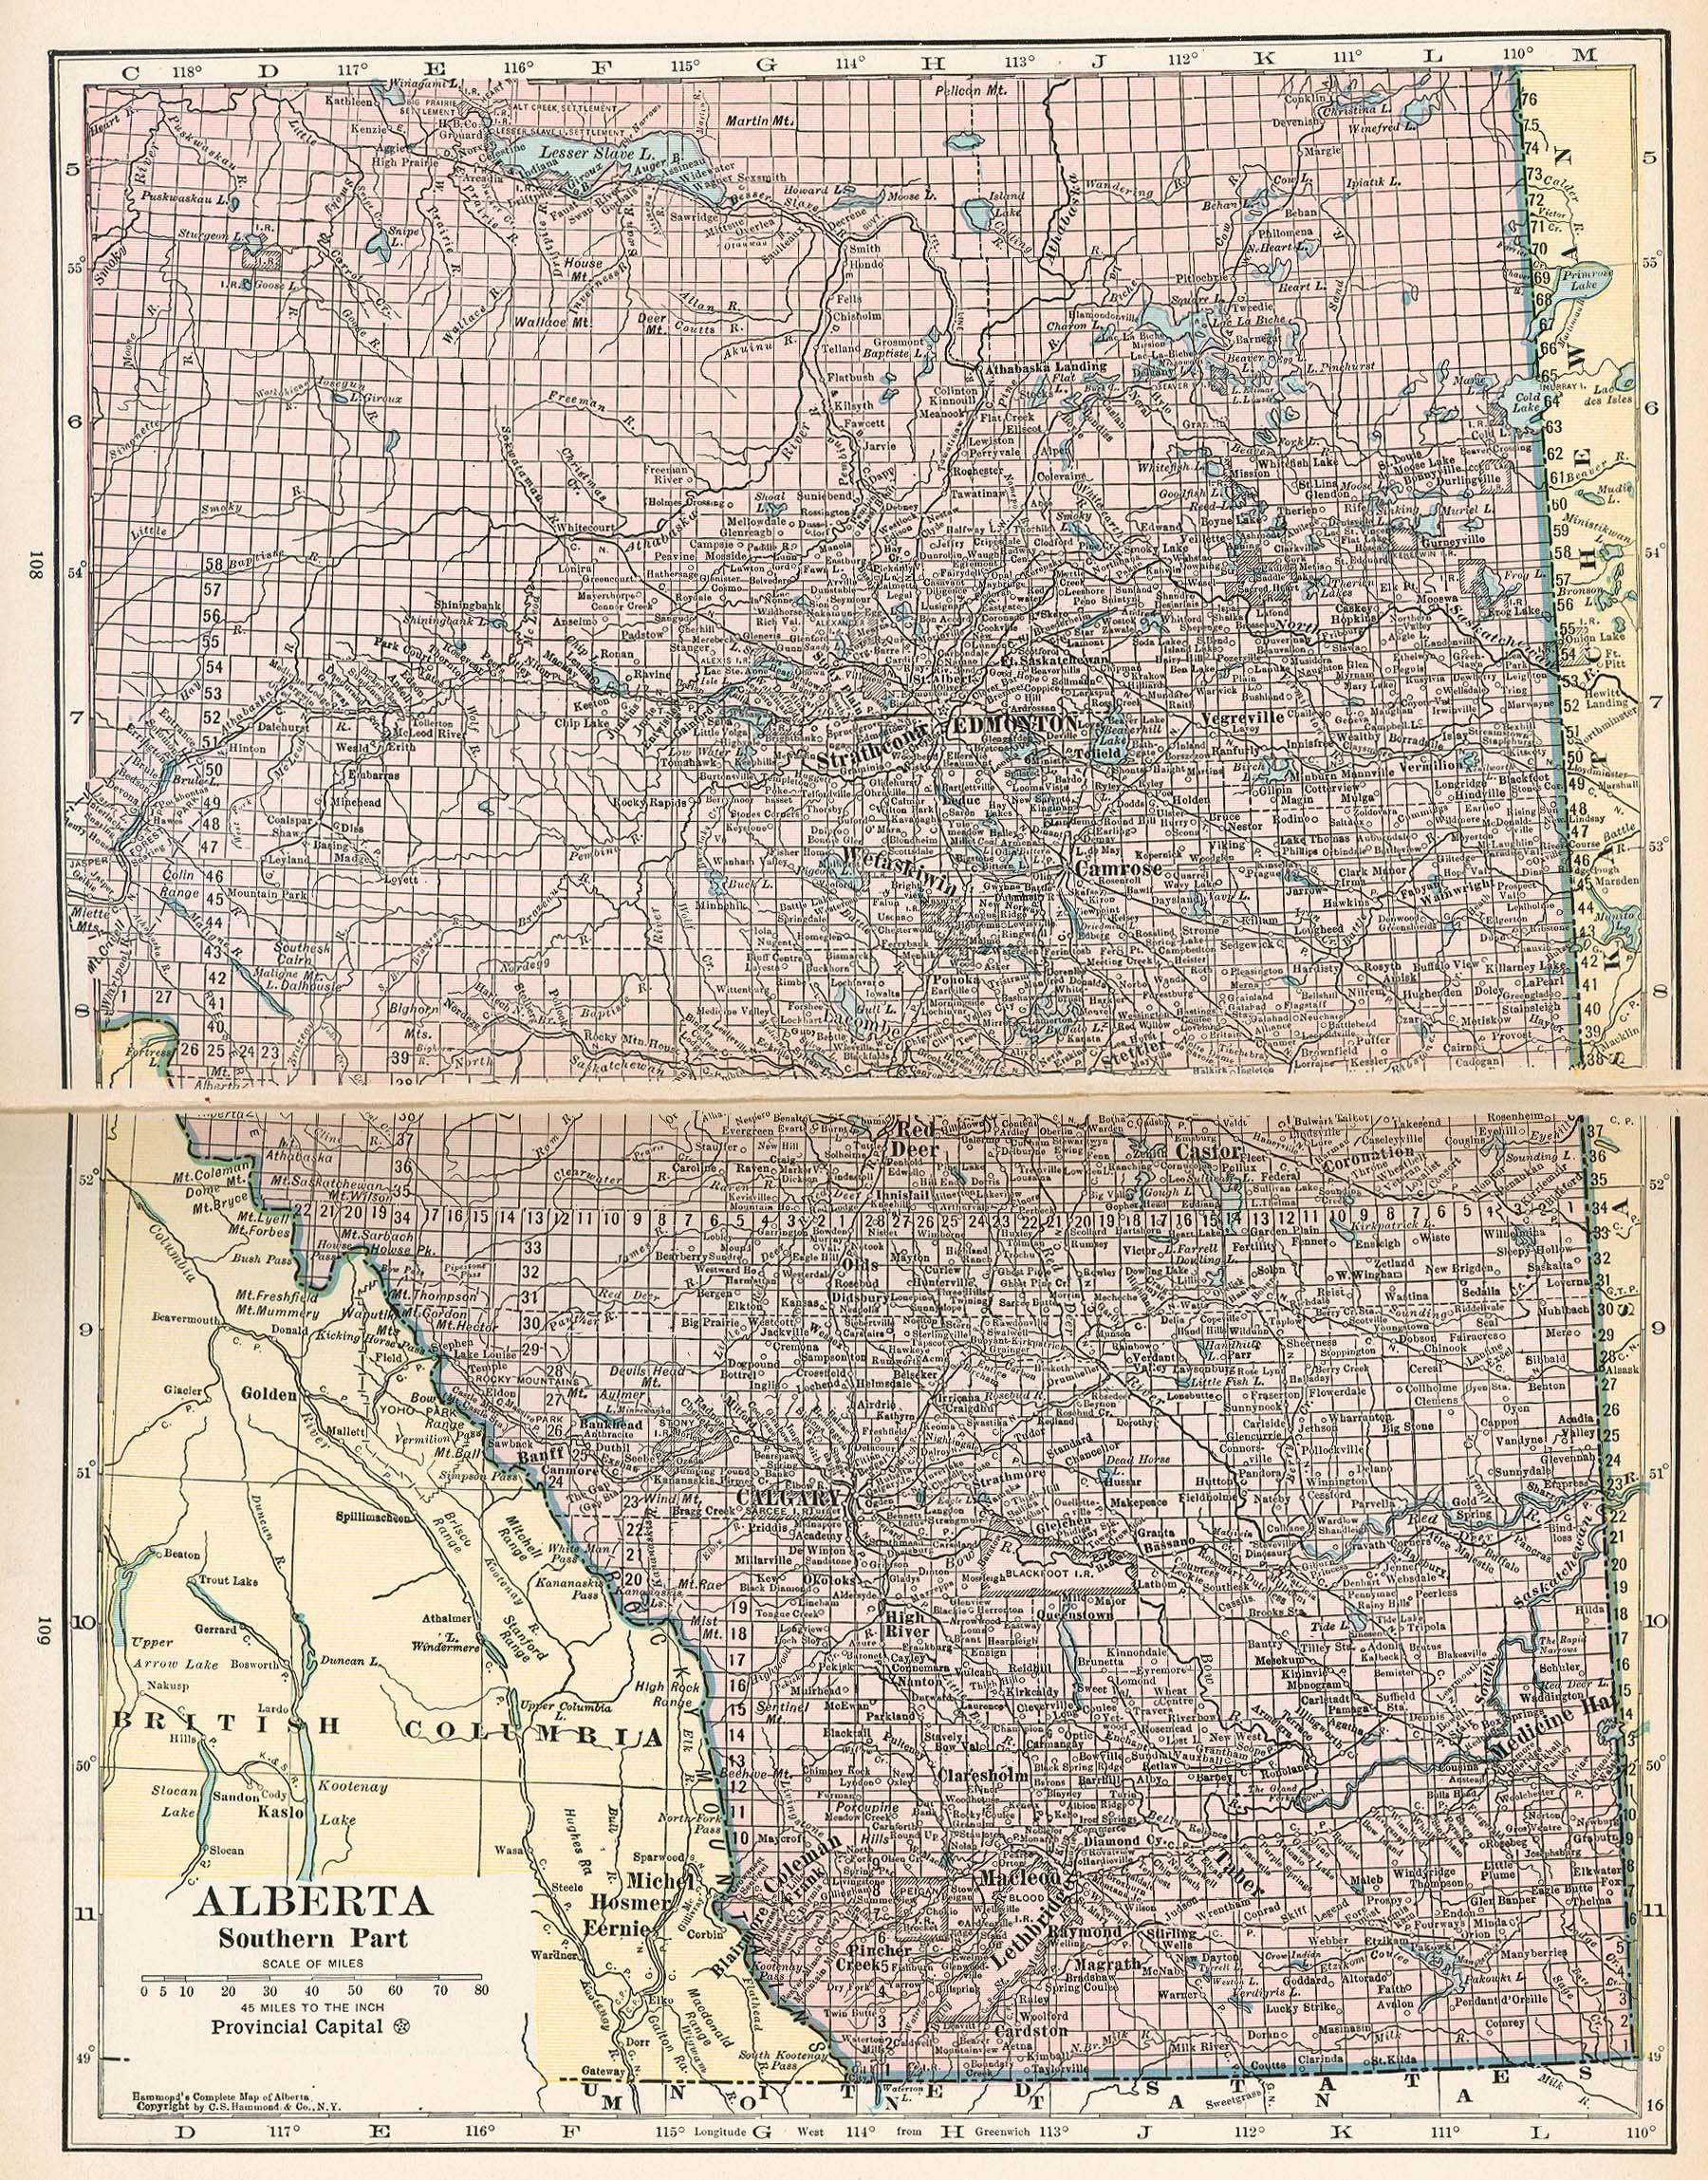 Mapa de Alberta, Canadá 1921